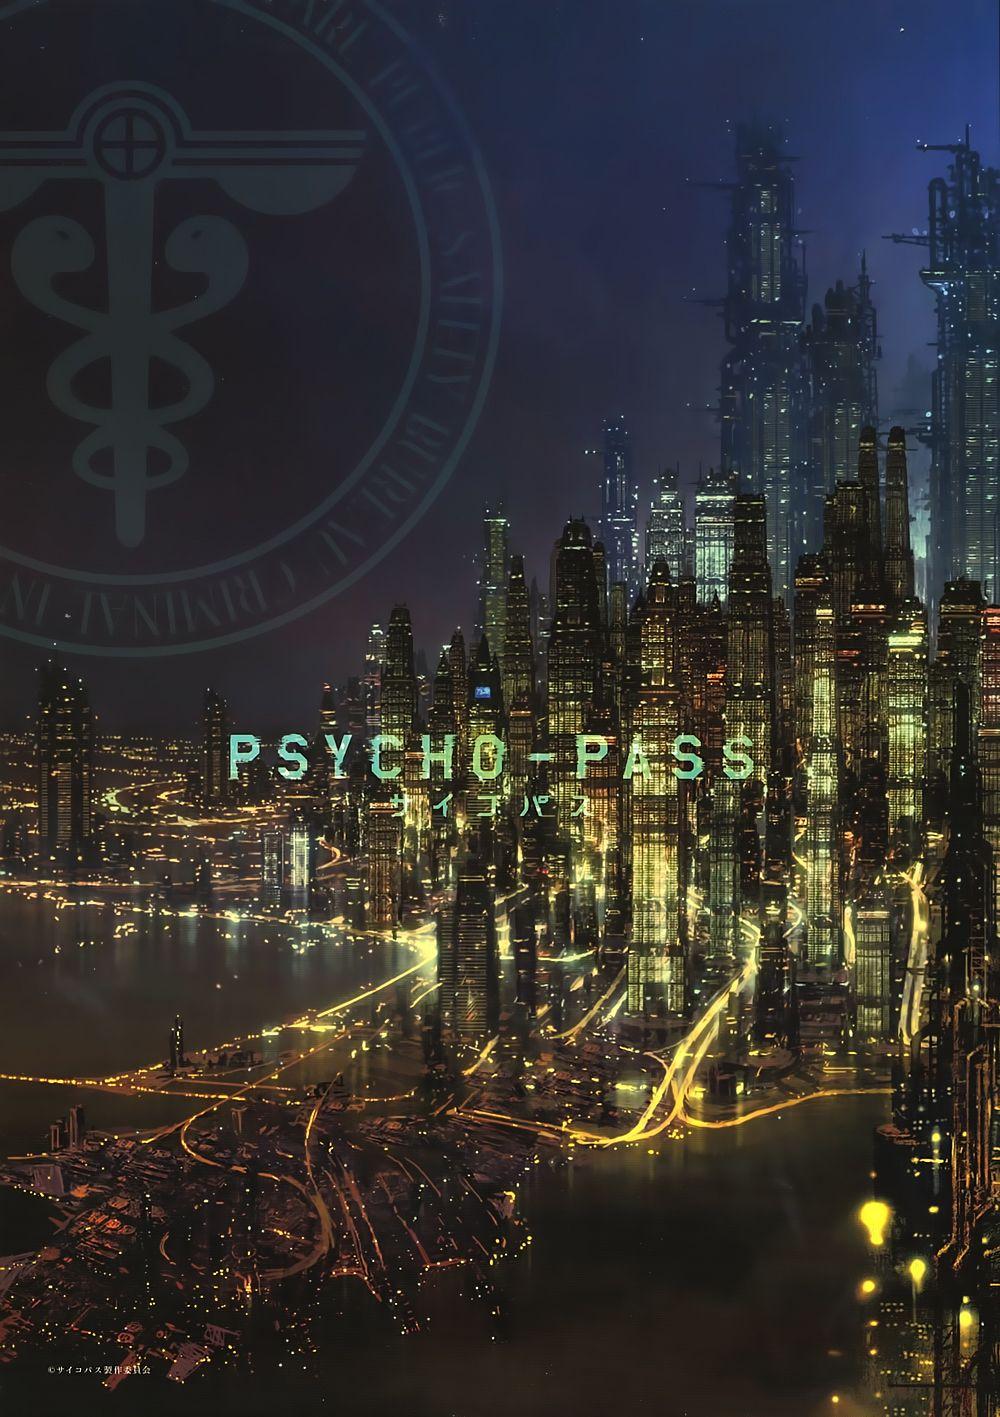 Psycho Pass サイコパス Iphone 壁紙 アニメ 携帯電話の壁紙